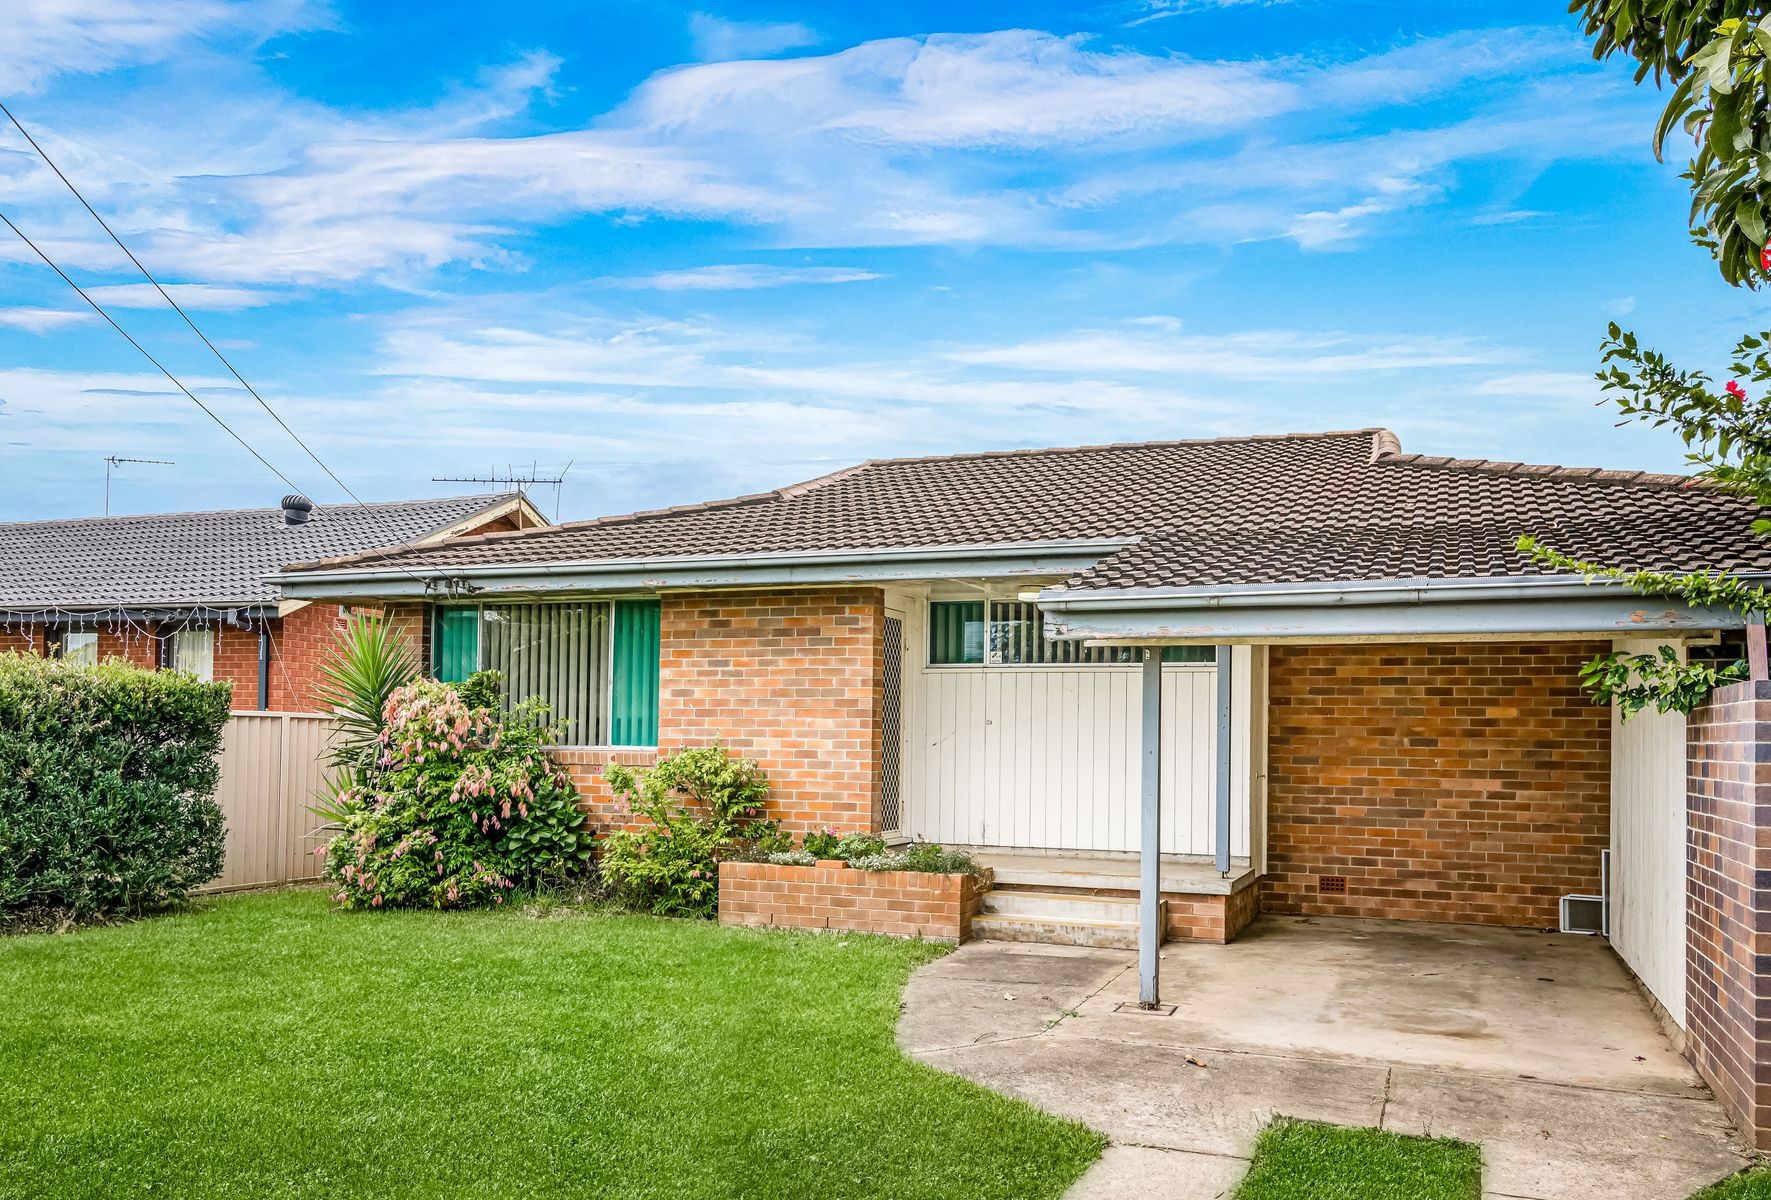 4 Cornwell Ave, Hobartville, NSW 2753